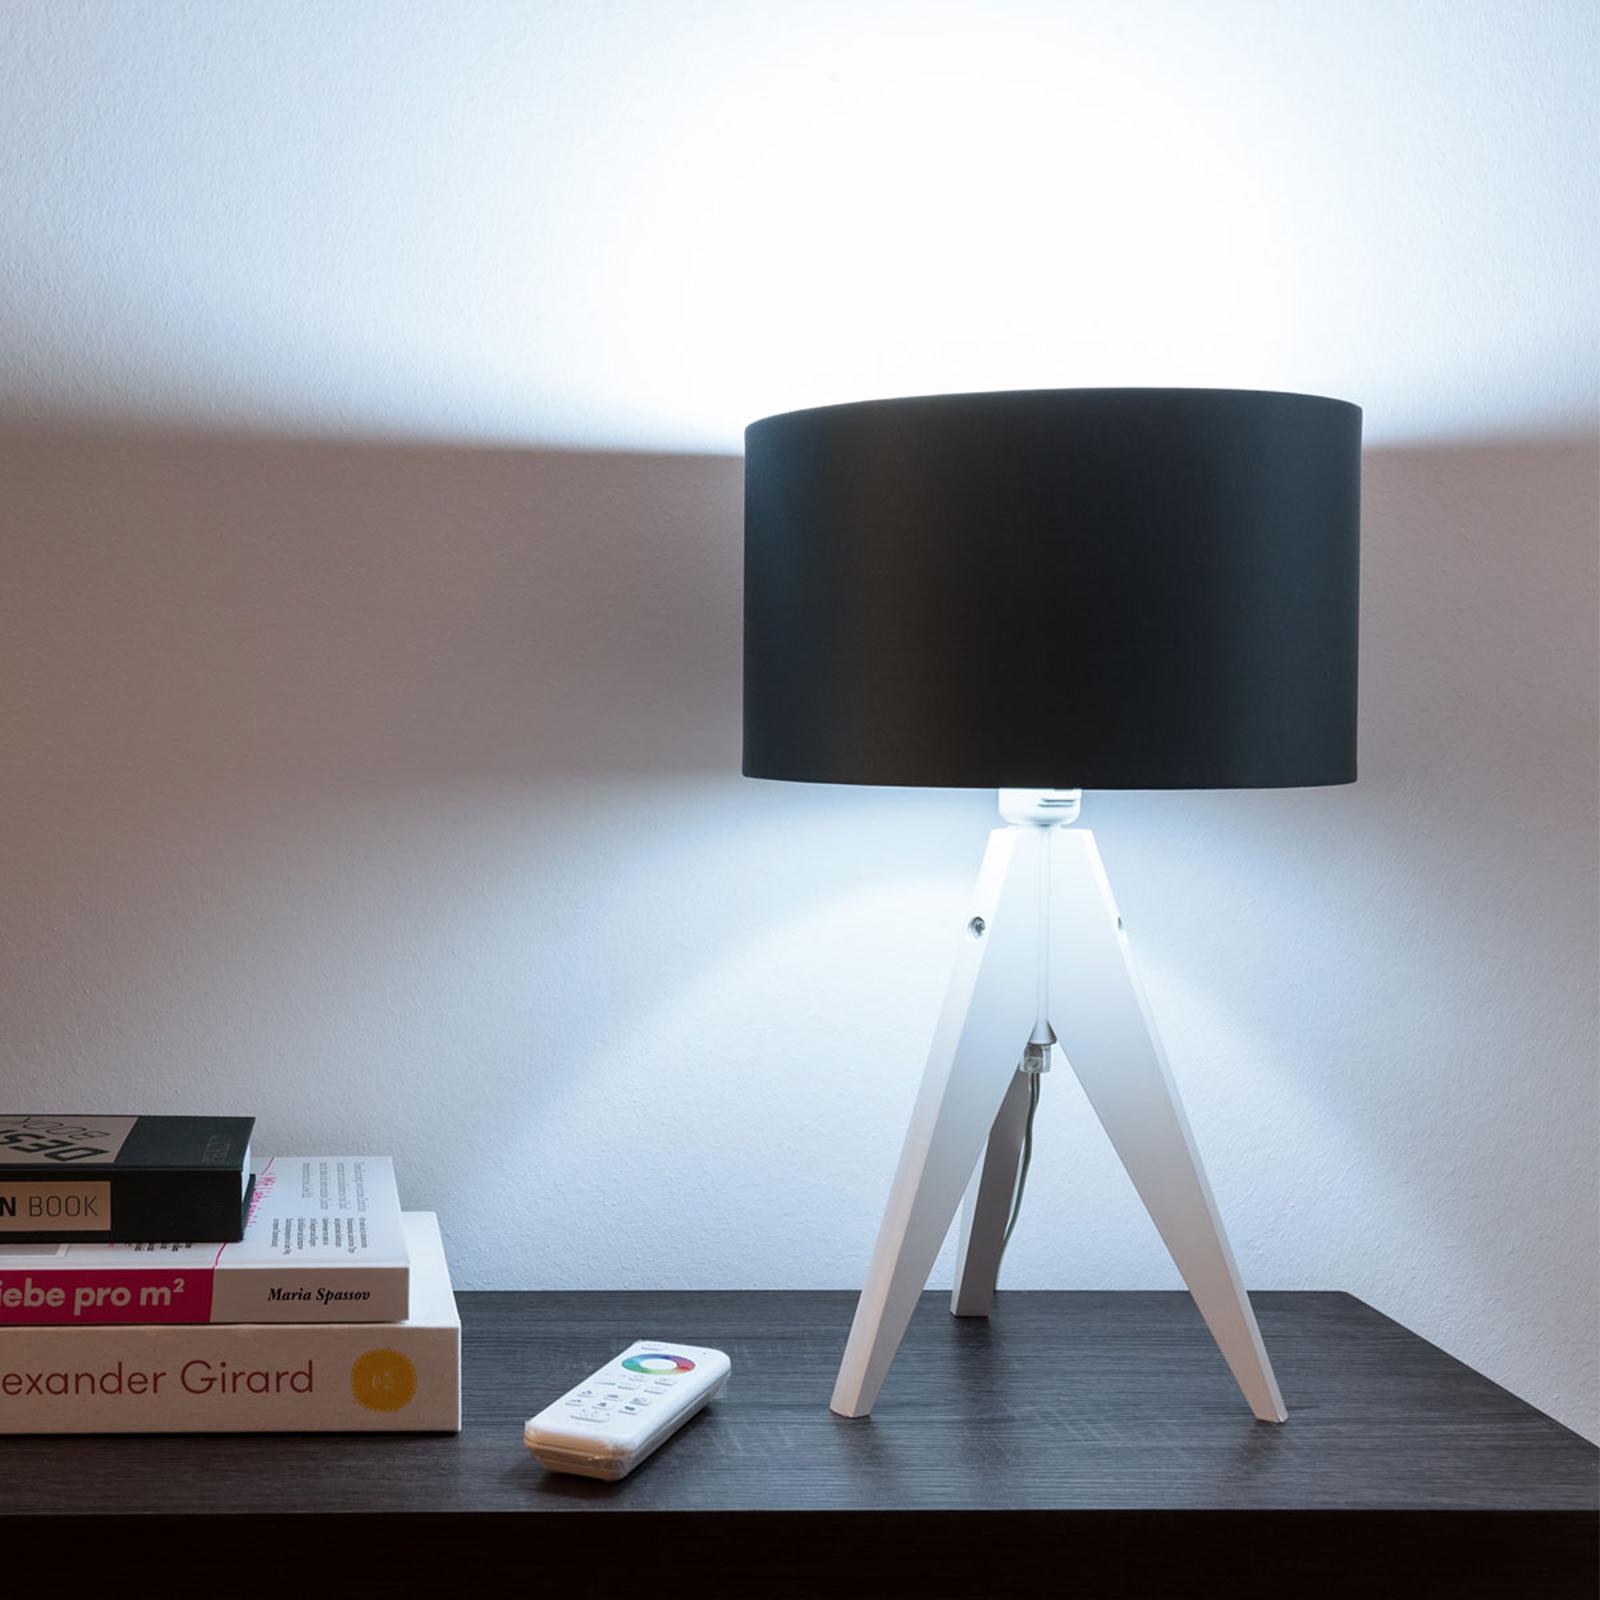 Müller Licht tint white+color Set 2xE27+Steuerung